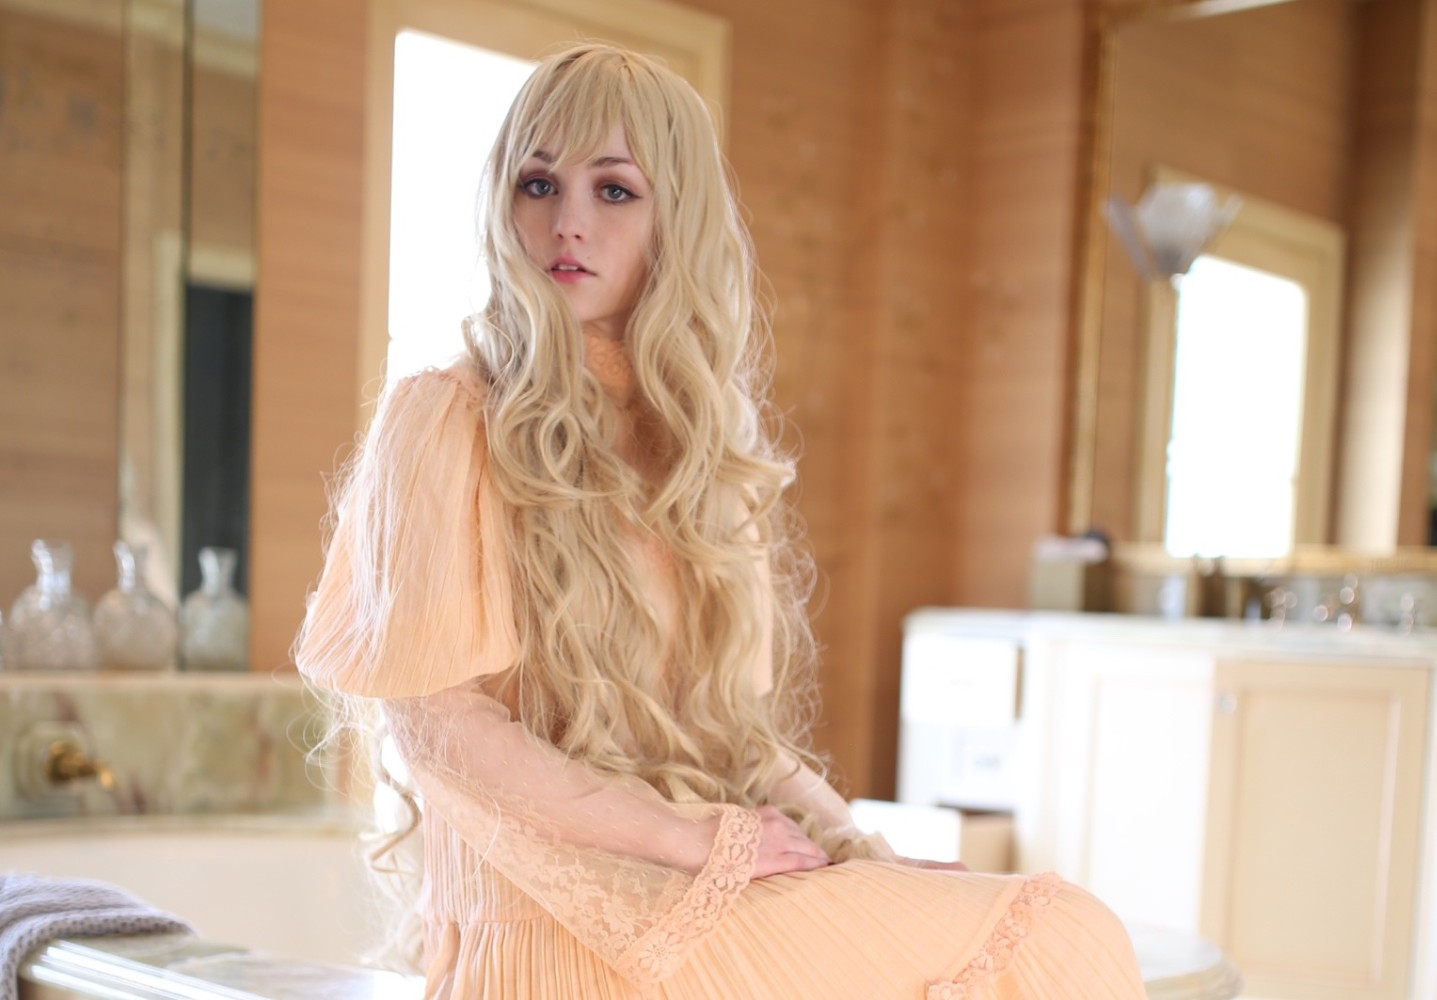 Nicole Dollanganger's Honeymoon Phase